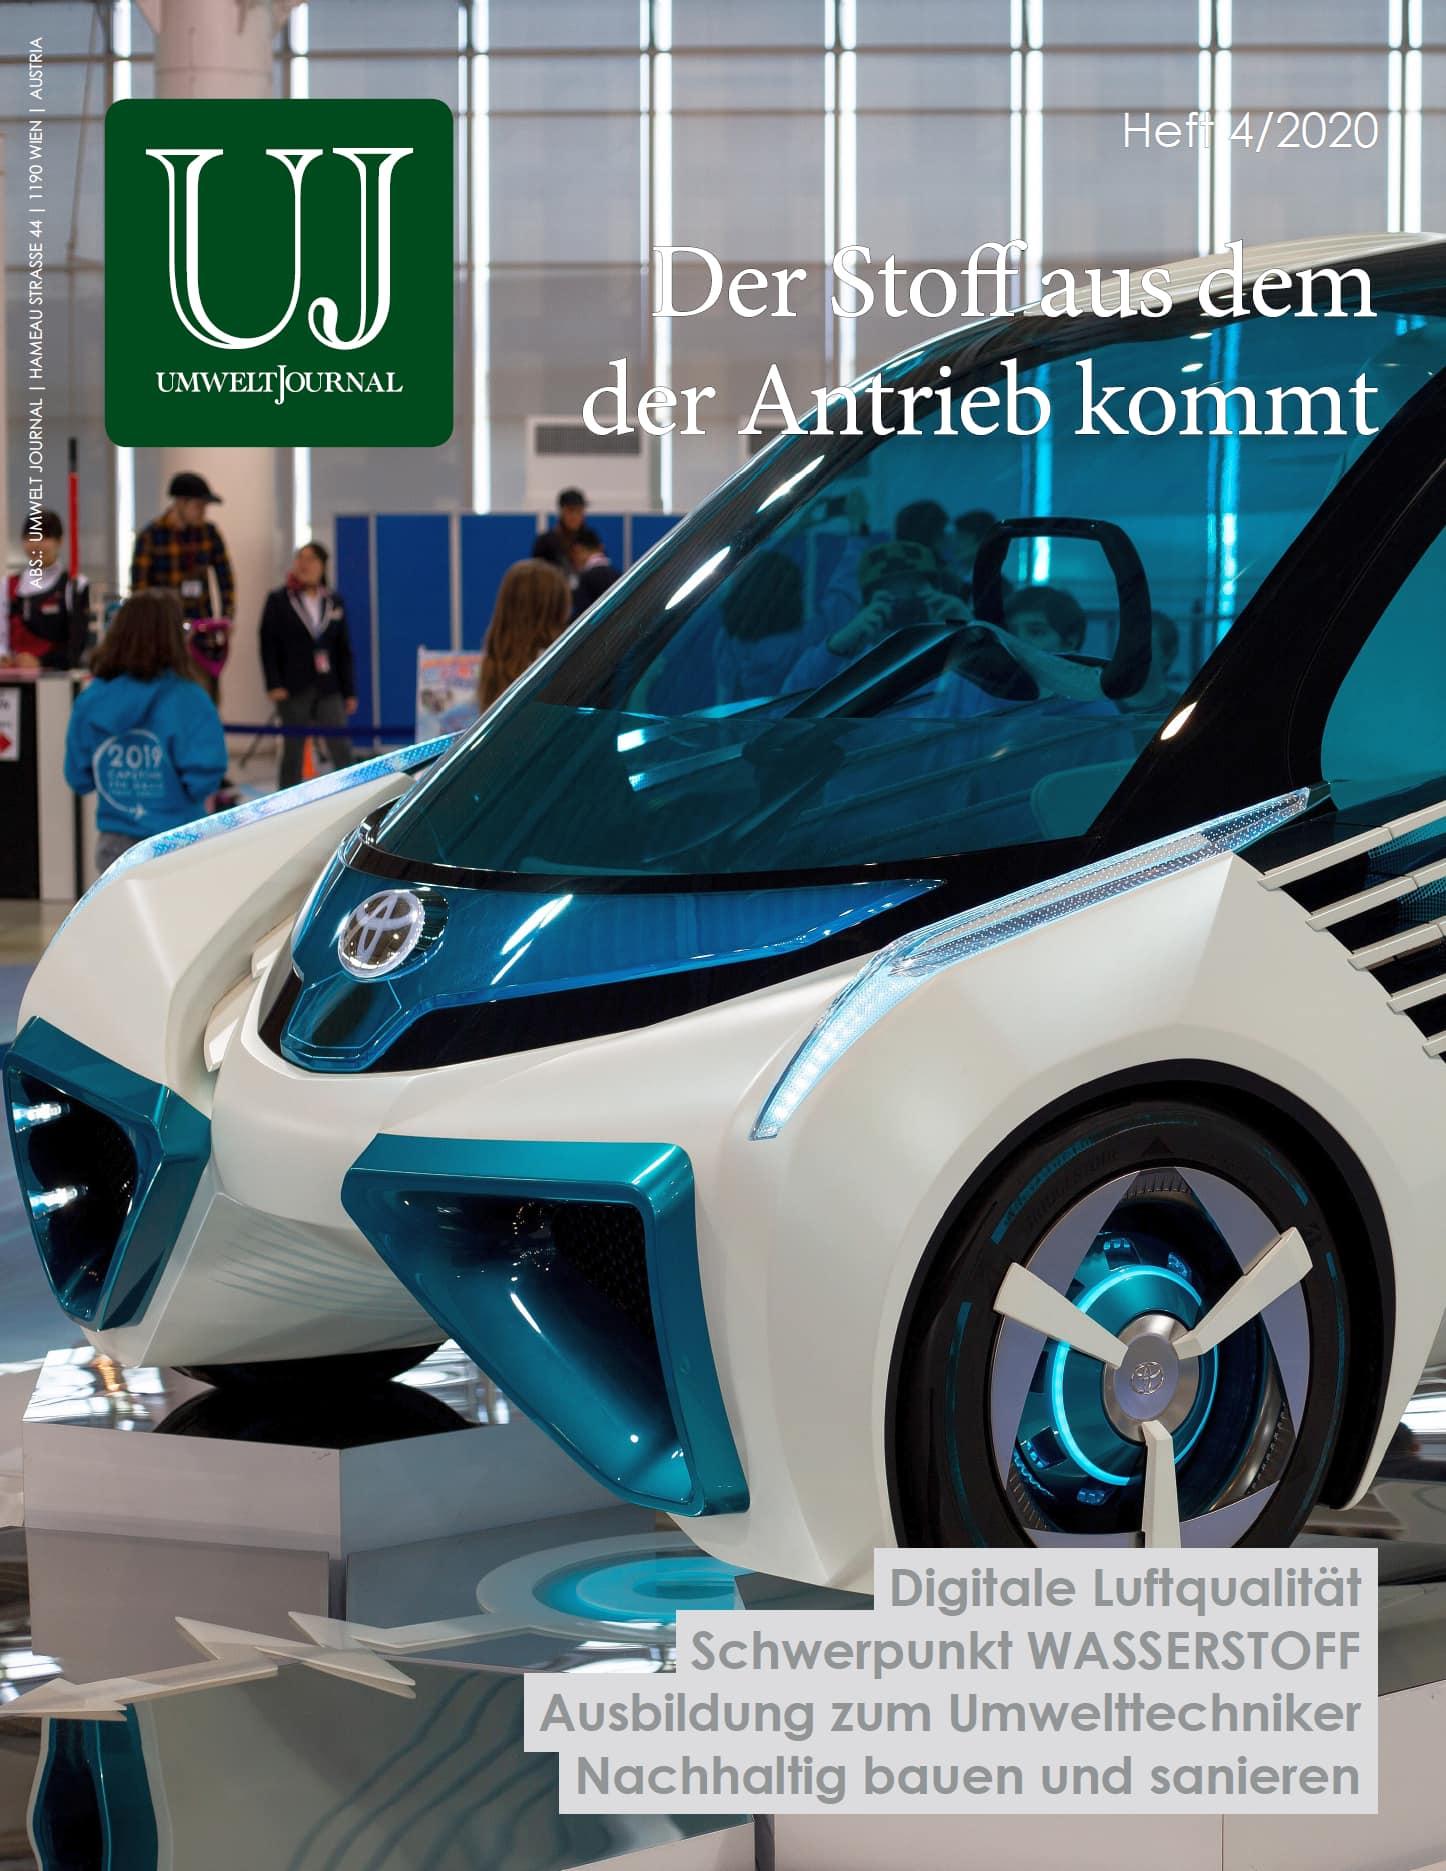 Foto: UMWELT JOURNAL Nr. 4/2020, Cover